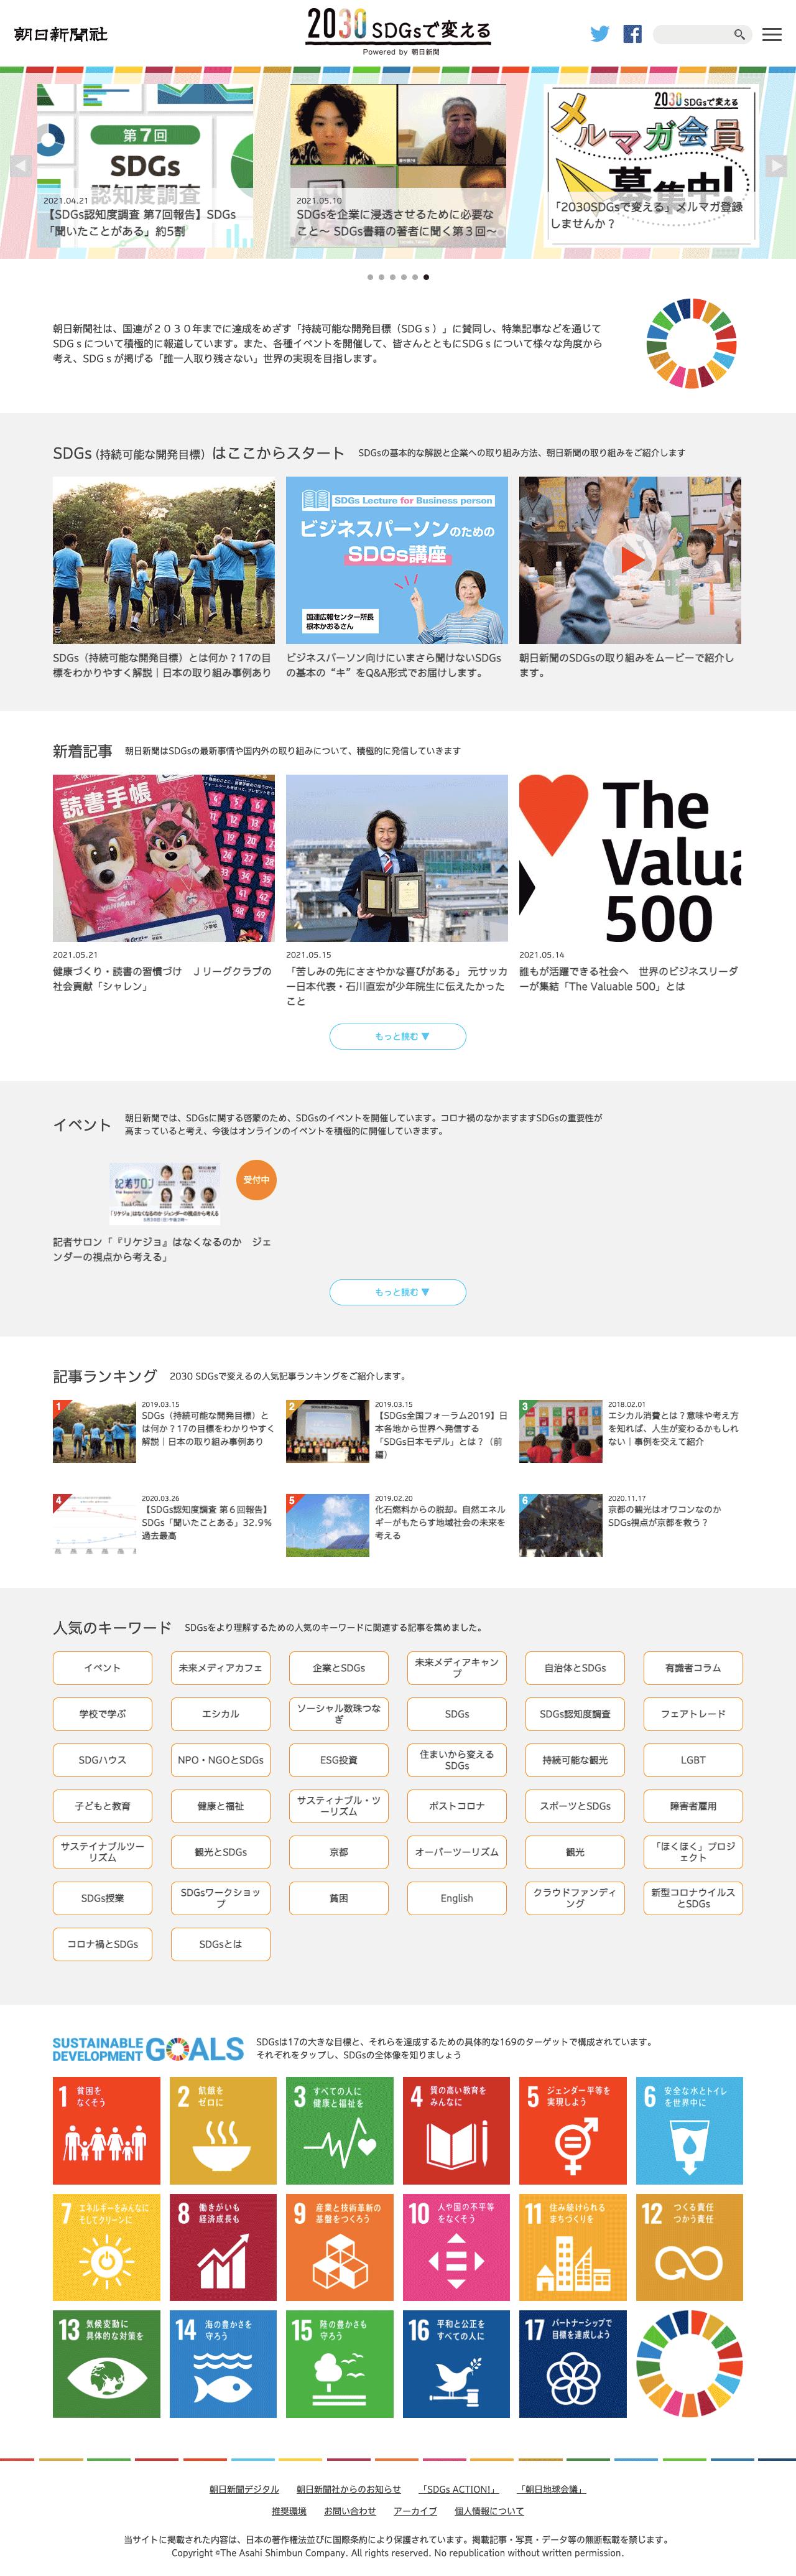 2030 SDGsで変える Powerd by 朝日新聞